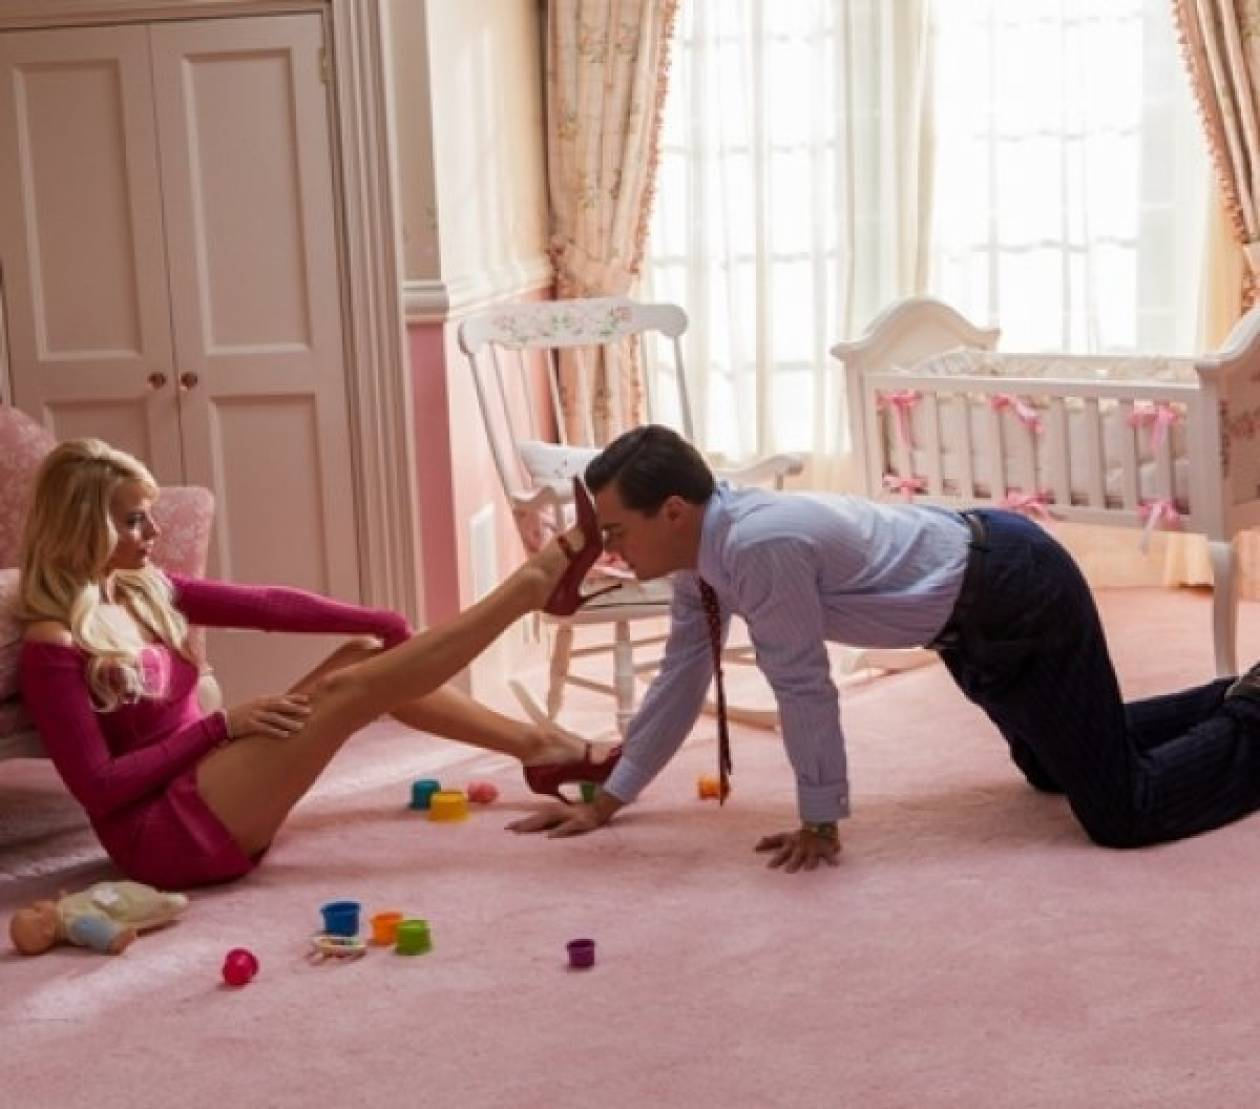 Margot Robbie: Τα σφηνάκια πριν τη γυμνή σκηνή με τον Di Caprio